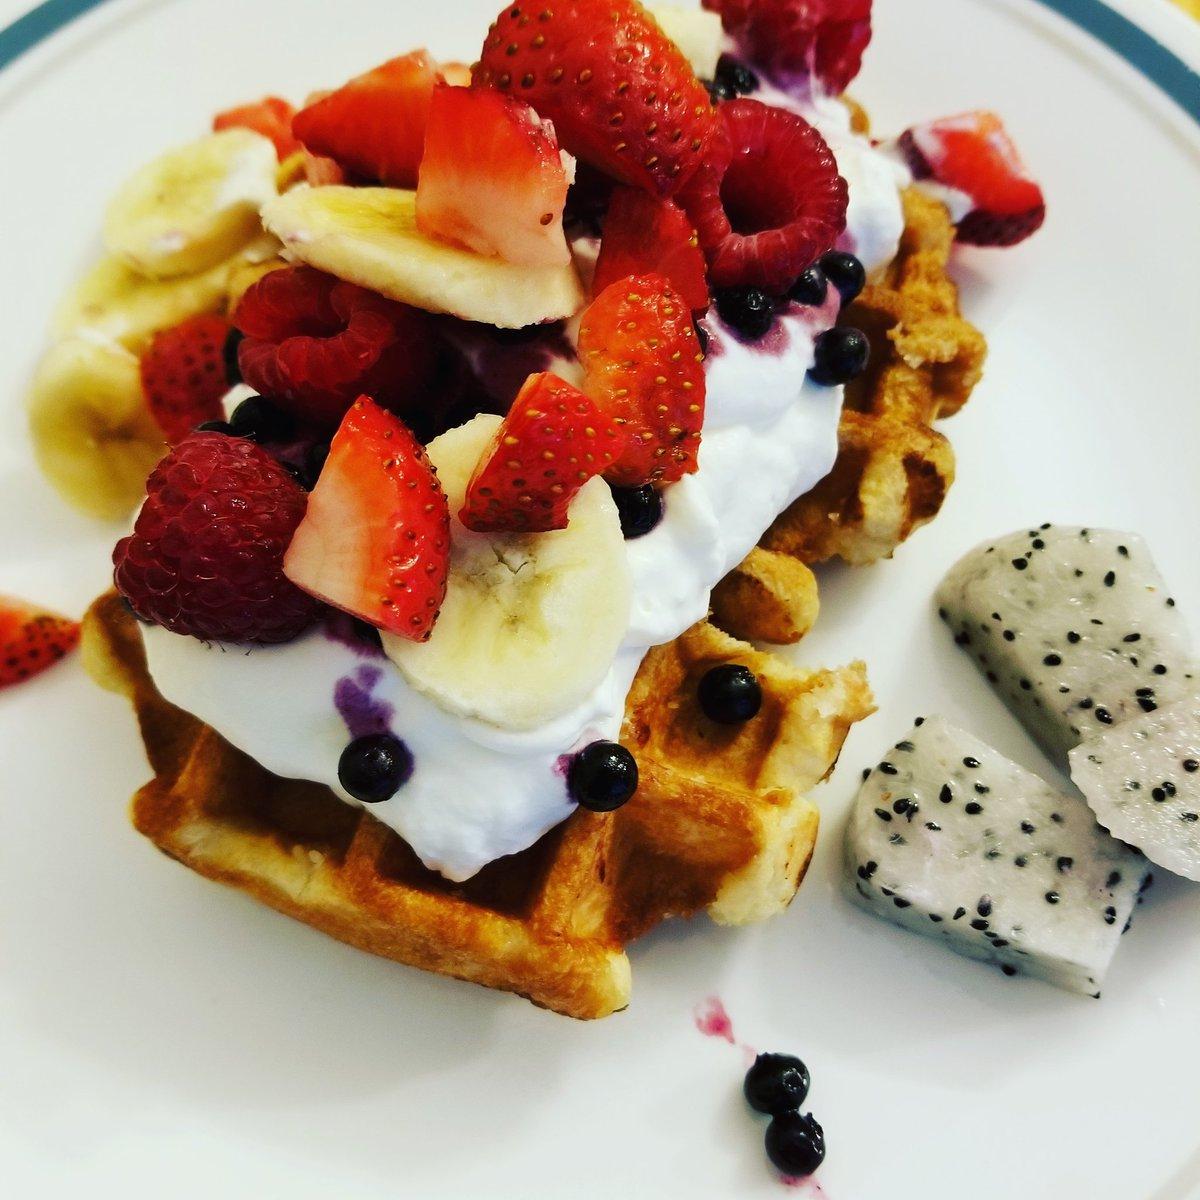 Breakfast for chubby champions! #fighterdiet #breakfastforchampions #breakfast #waffles https://t.co/xKhHqZzcvP